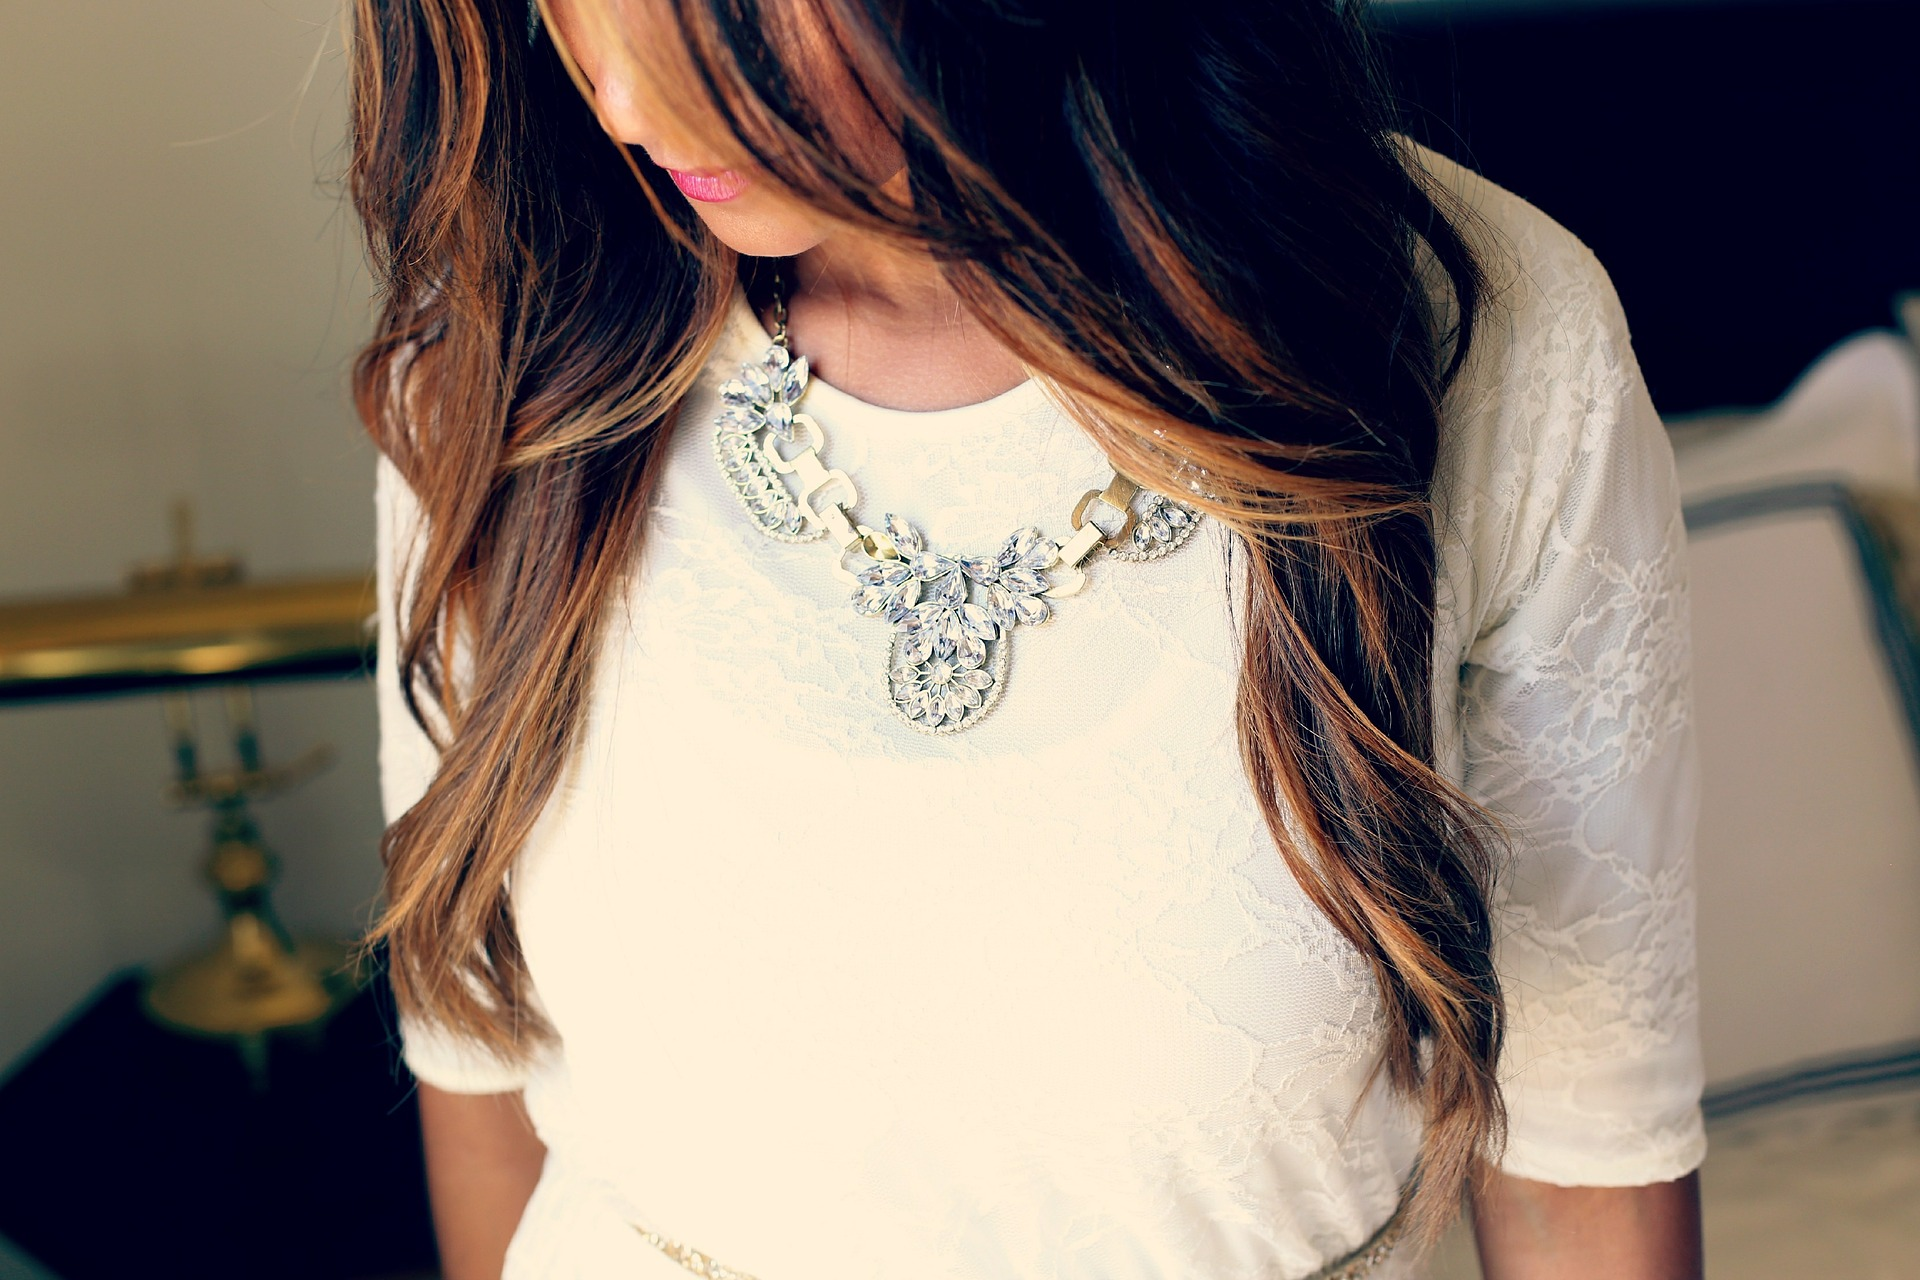 accessories-519693_1920 (1)